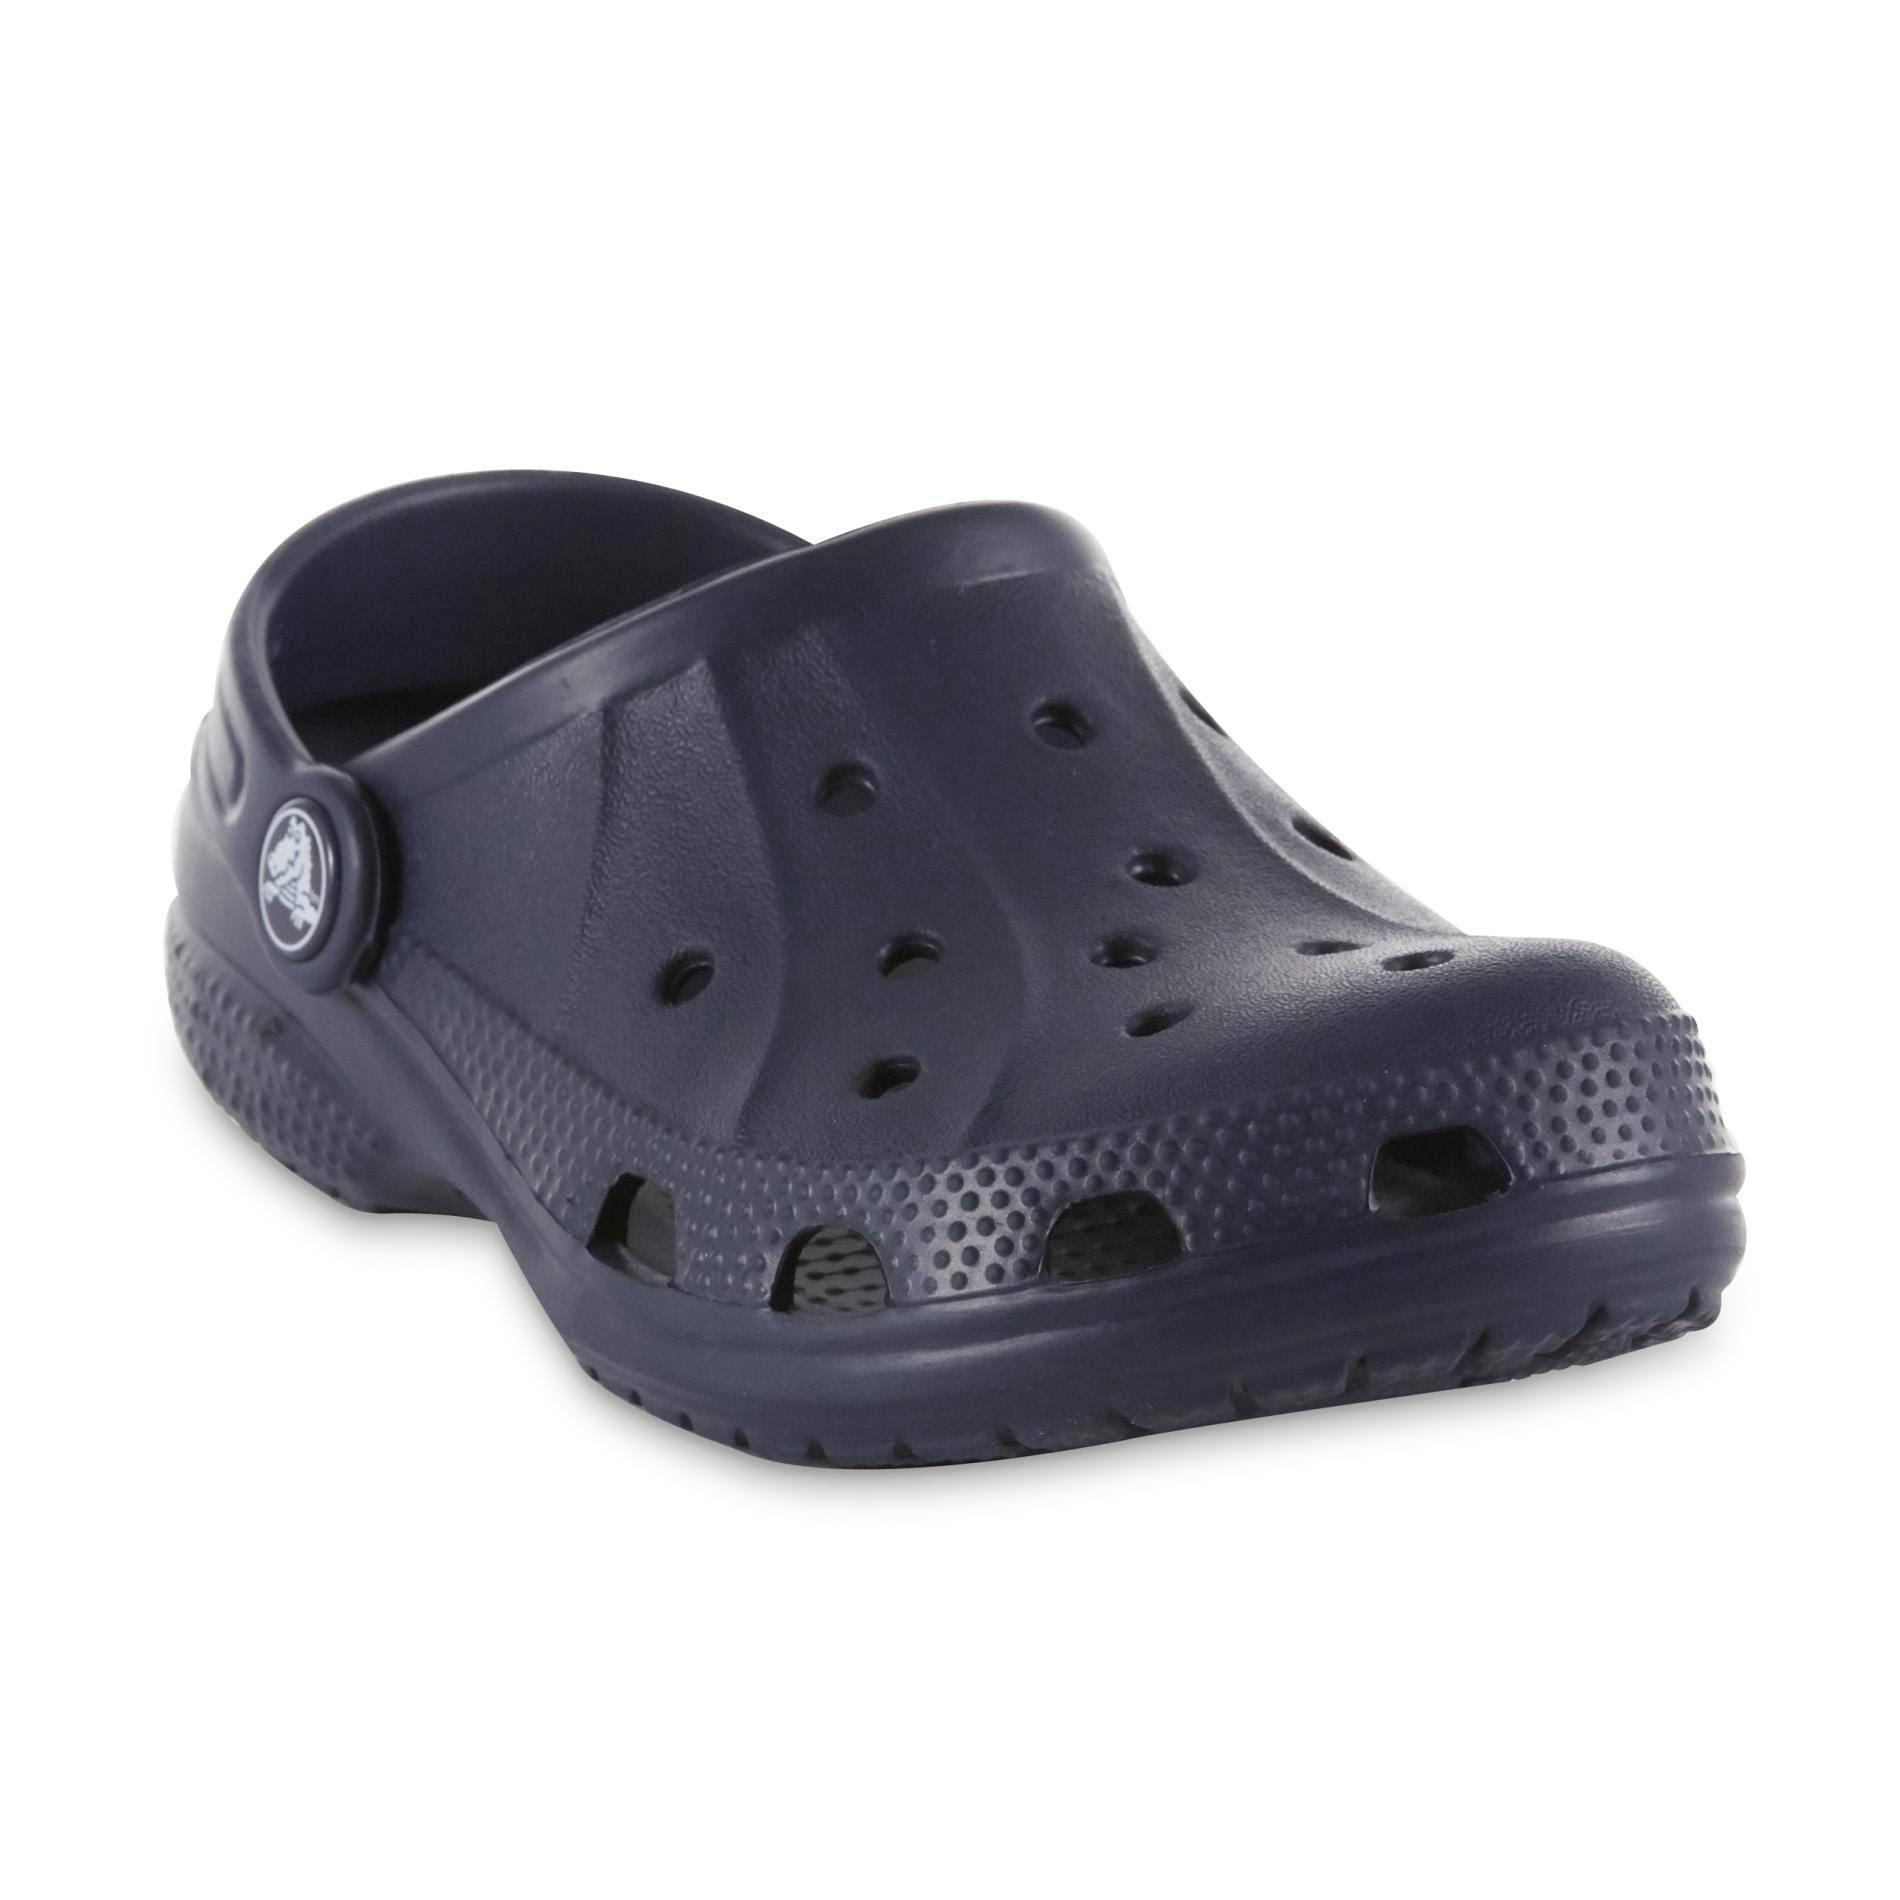 Crocs Kids Kids Crocs Clog Navy Navy Ralen Ralen Clog Crocs MVLGzSqUp